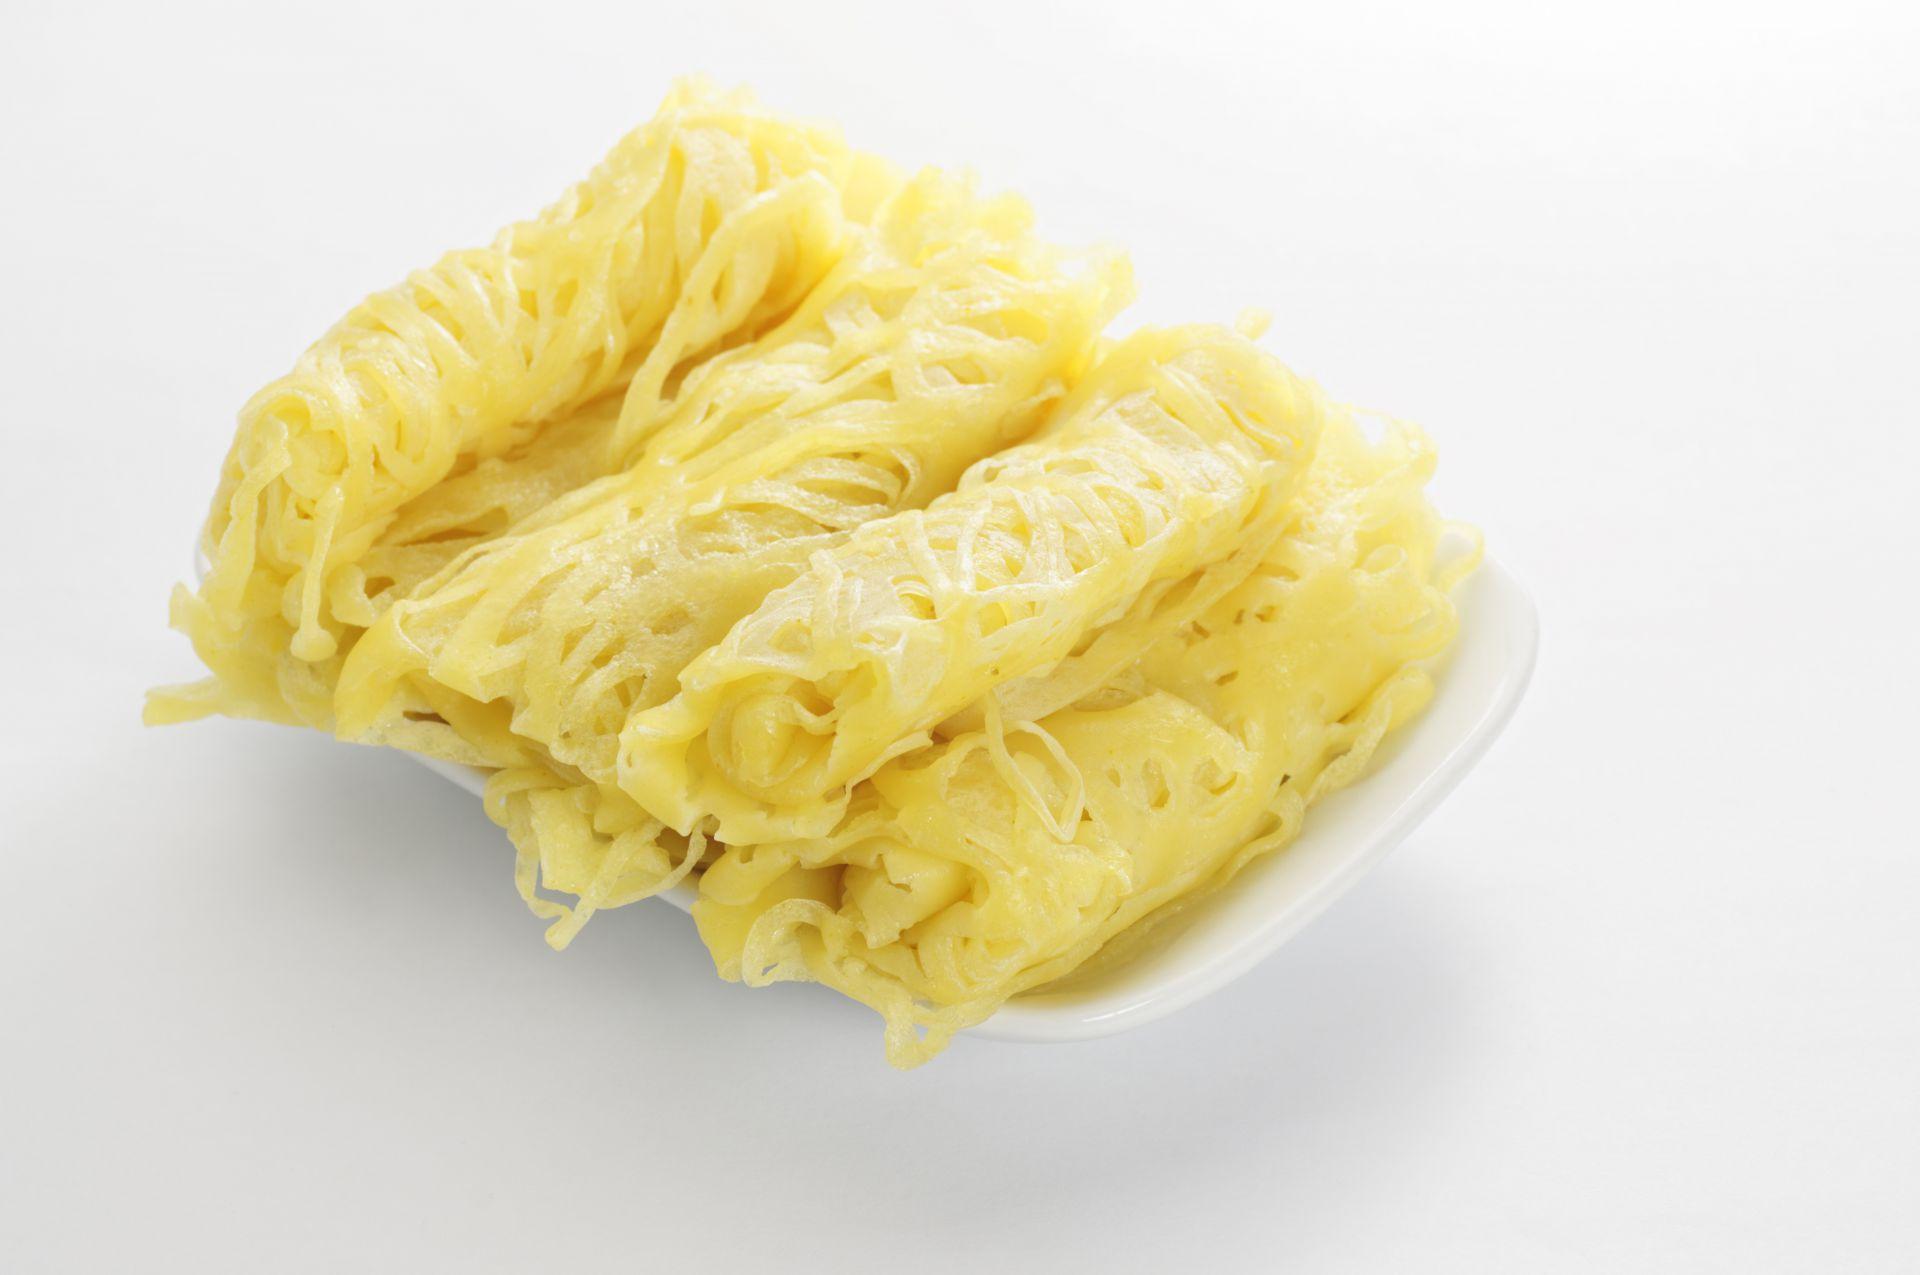 Resep Roti Jala Susu UHT